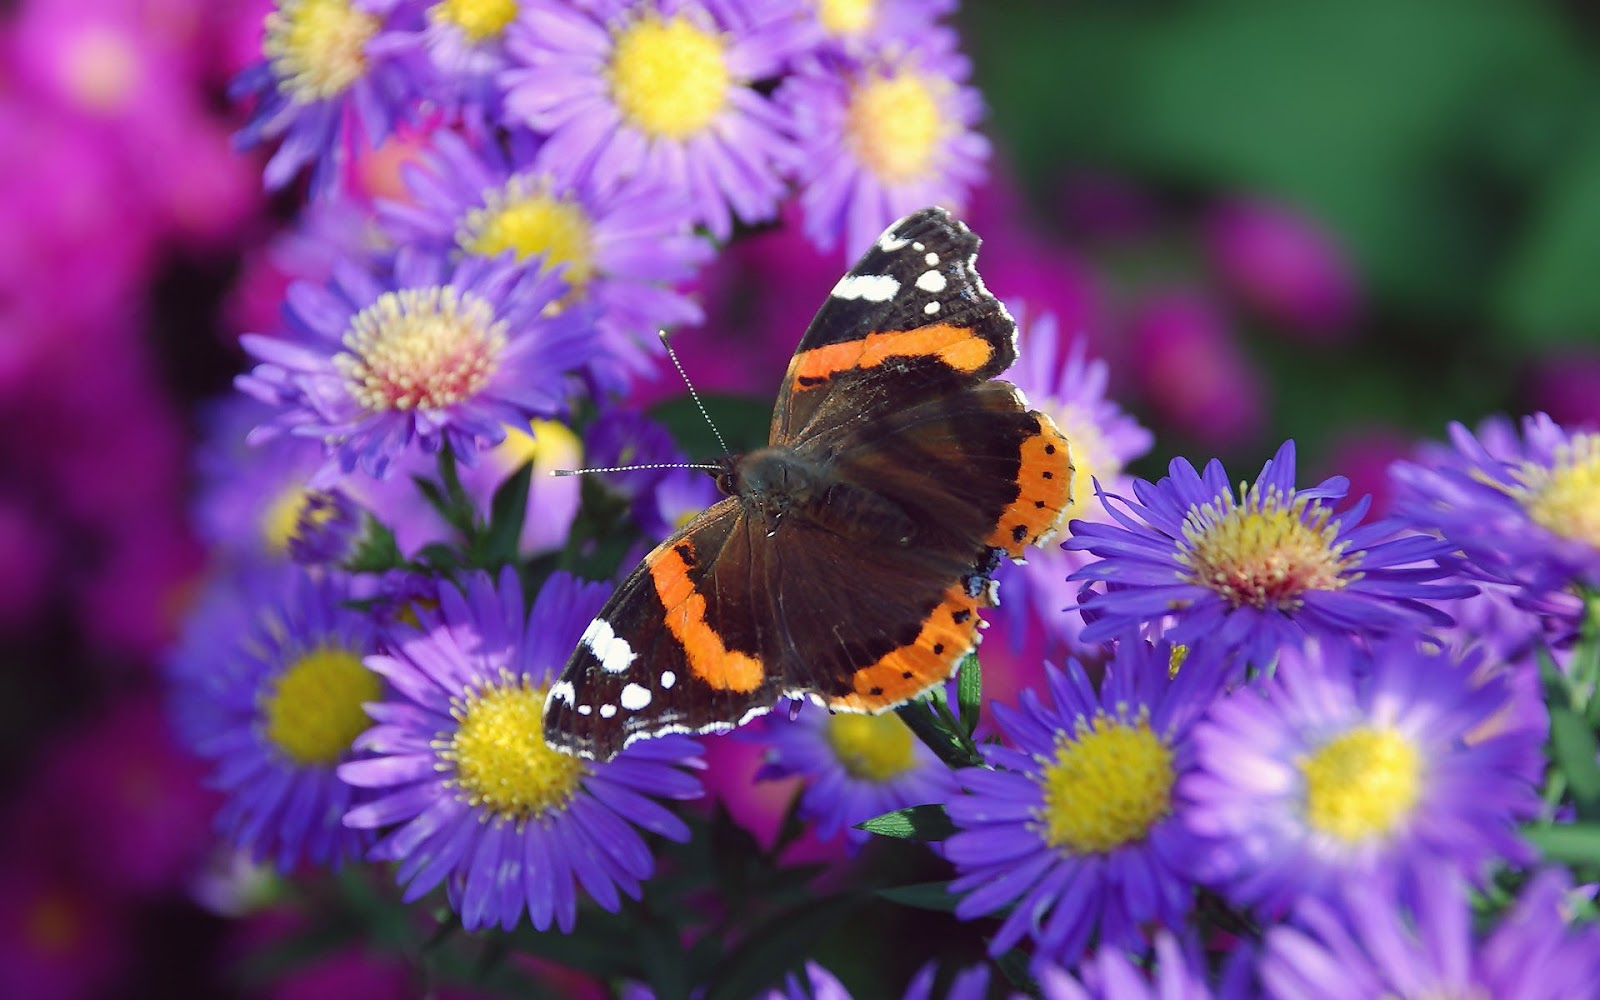 28 flowers with butterflies what flowers do butterflies